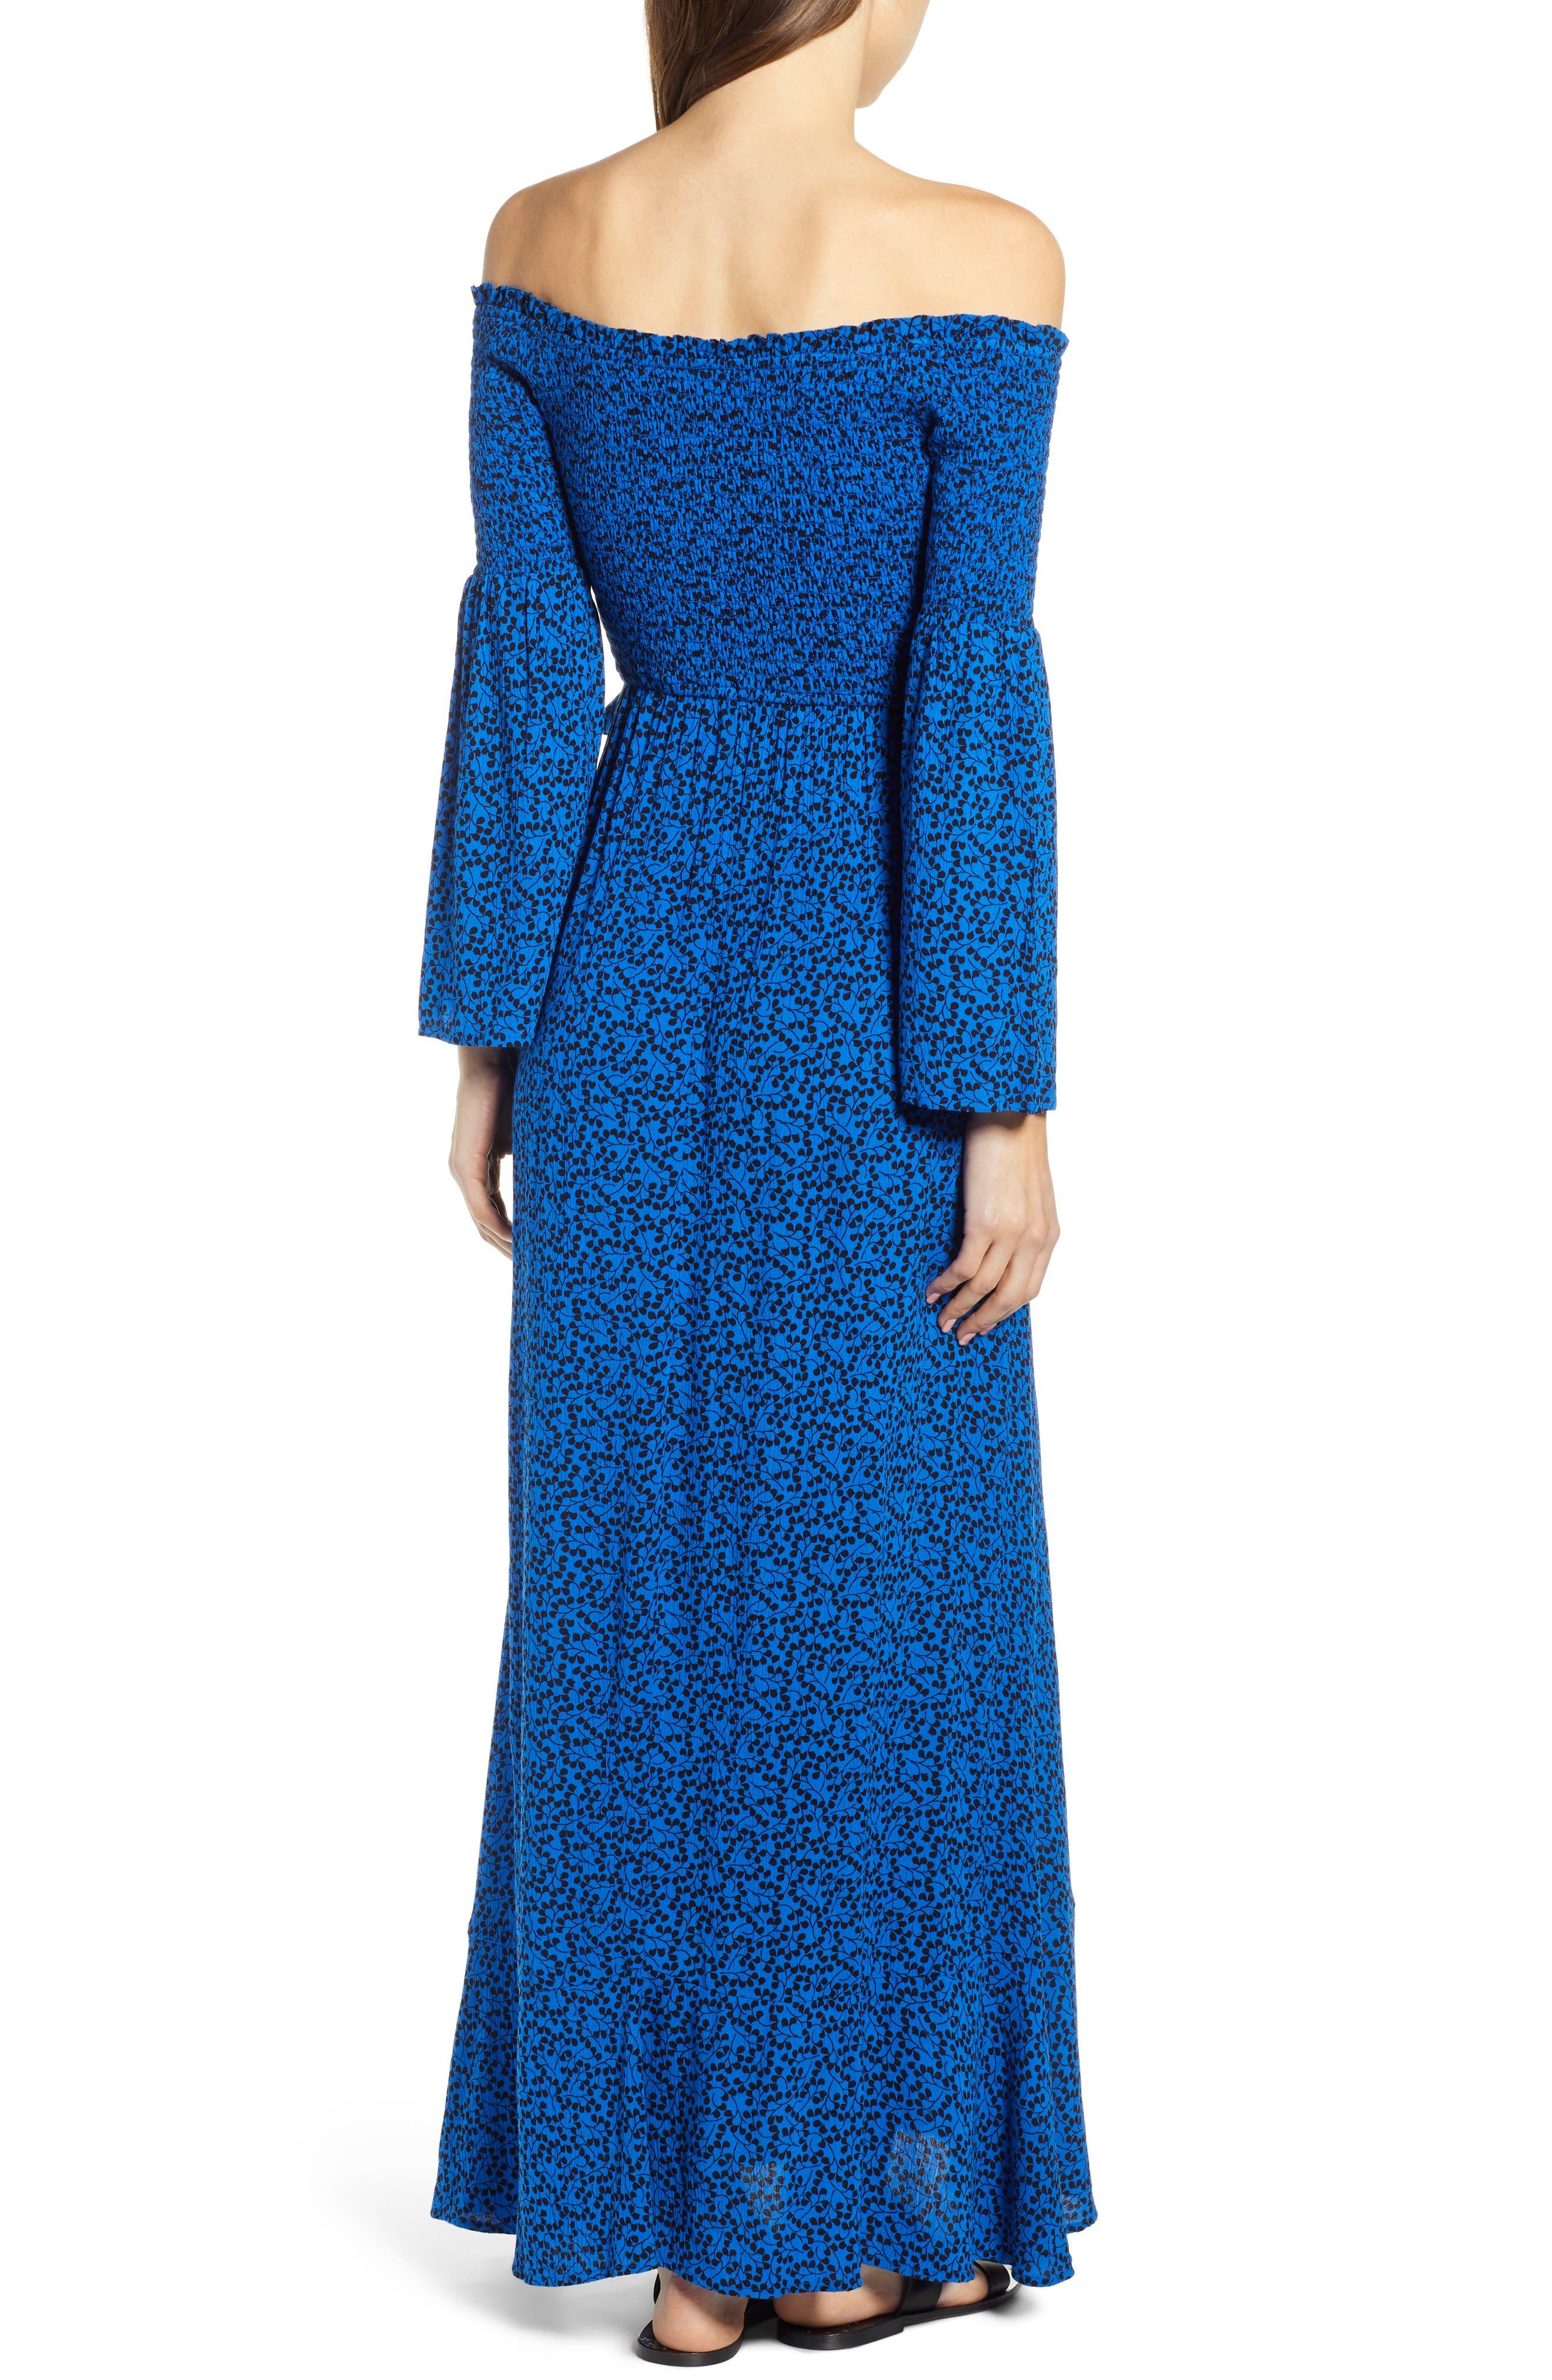 Bali Off The Shoulder Maxi Dress,                             Alternate thumbnail 2, color,                             ROYAL/ BLACK